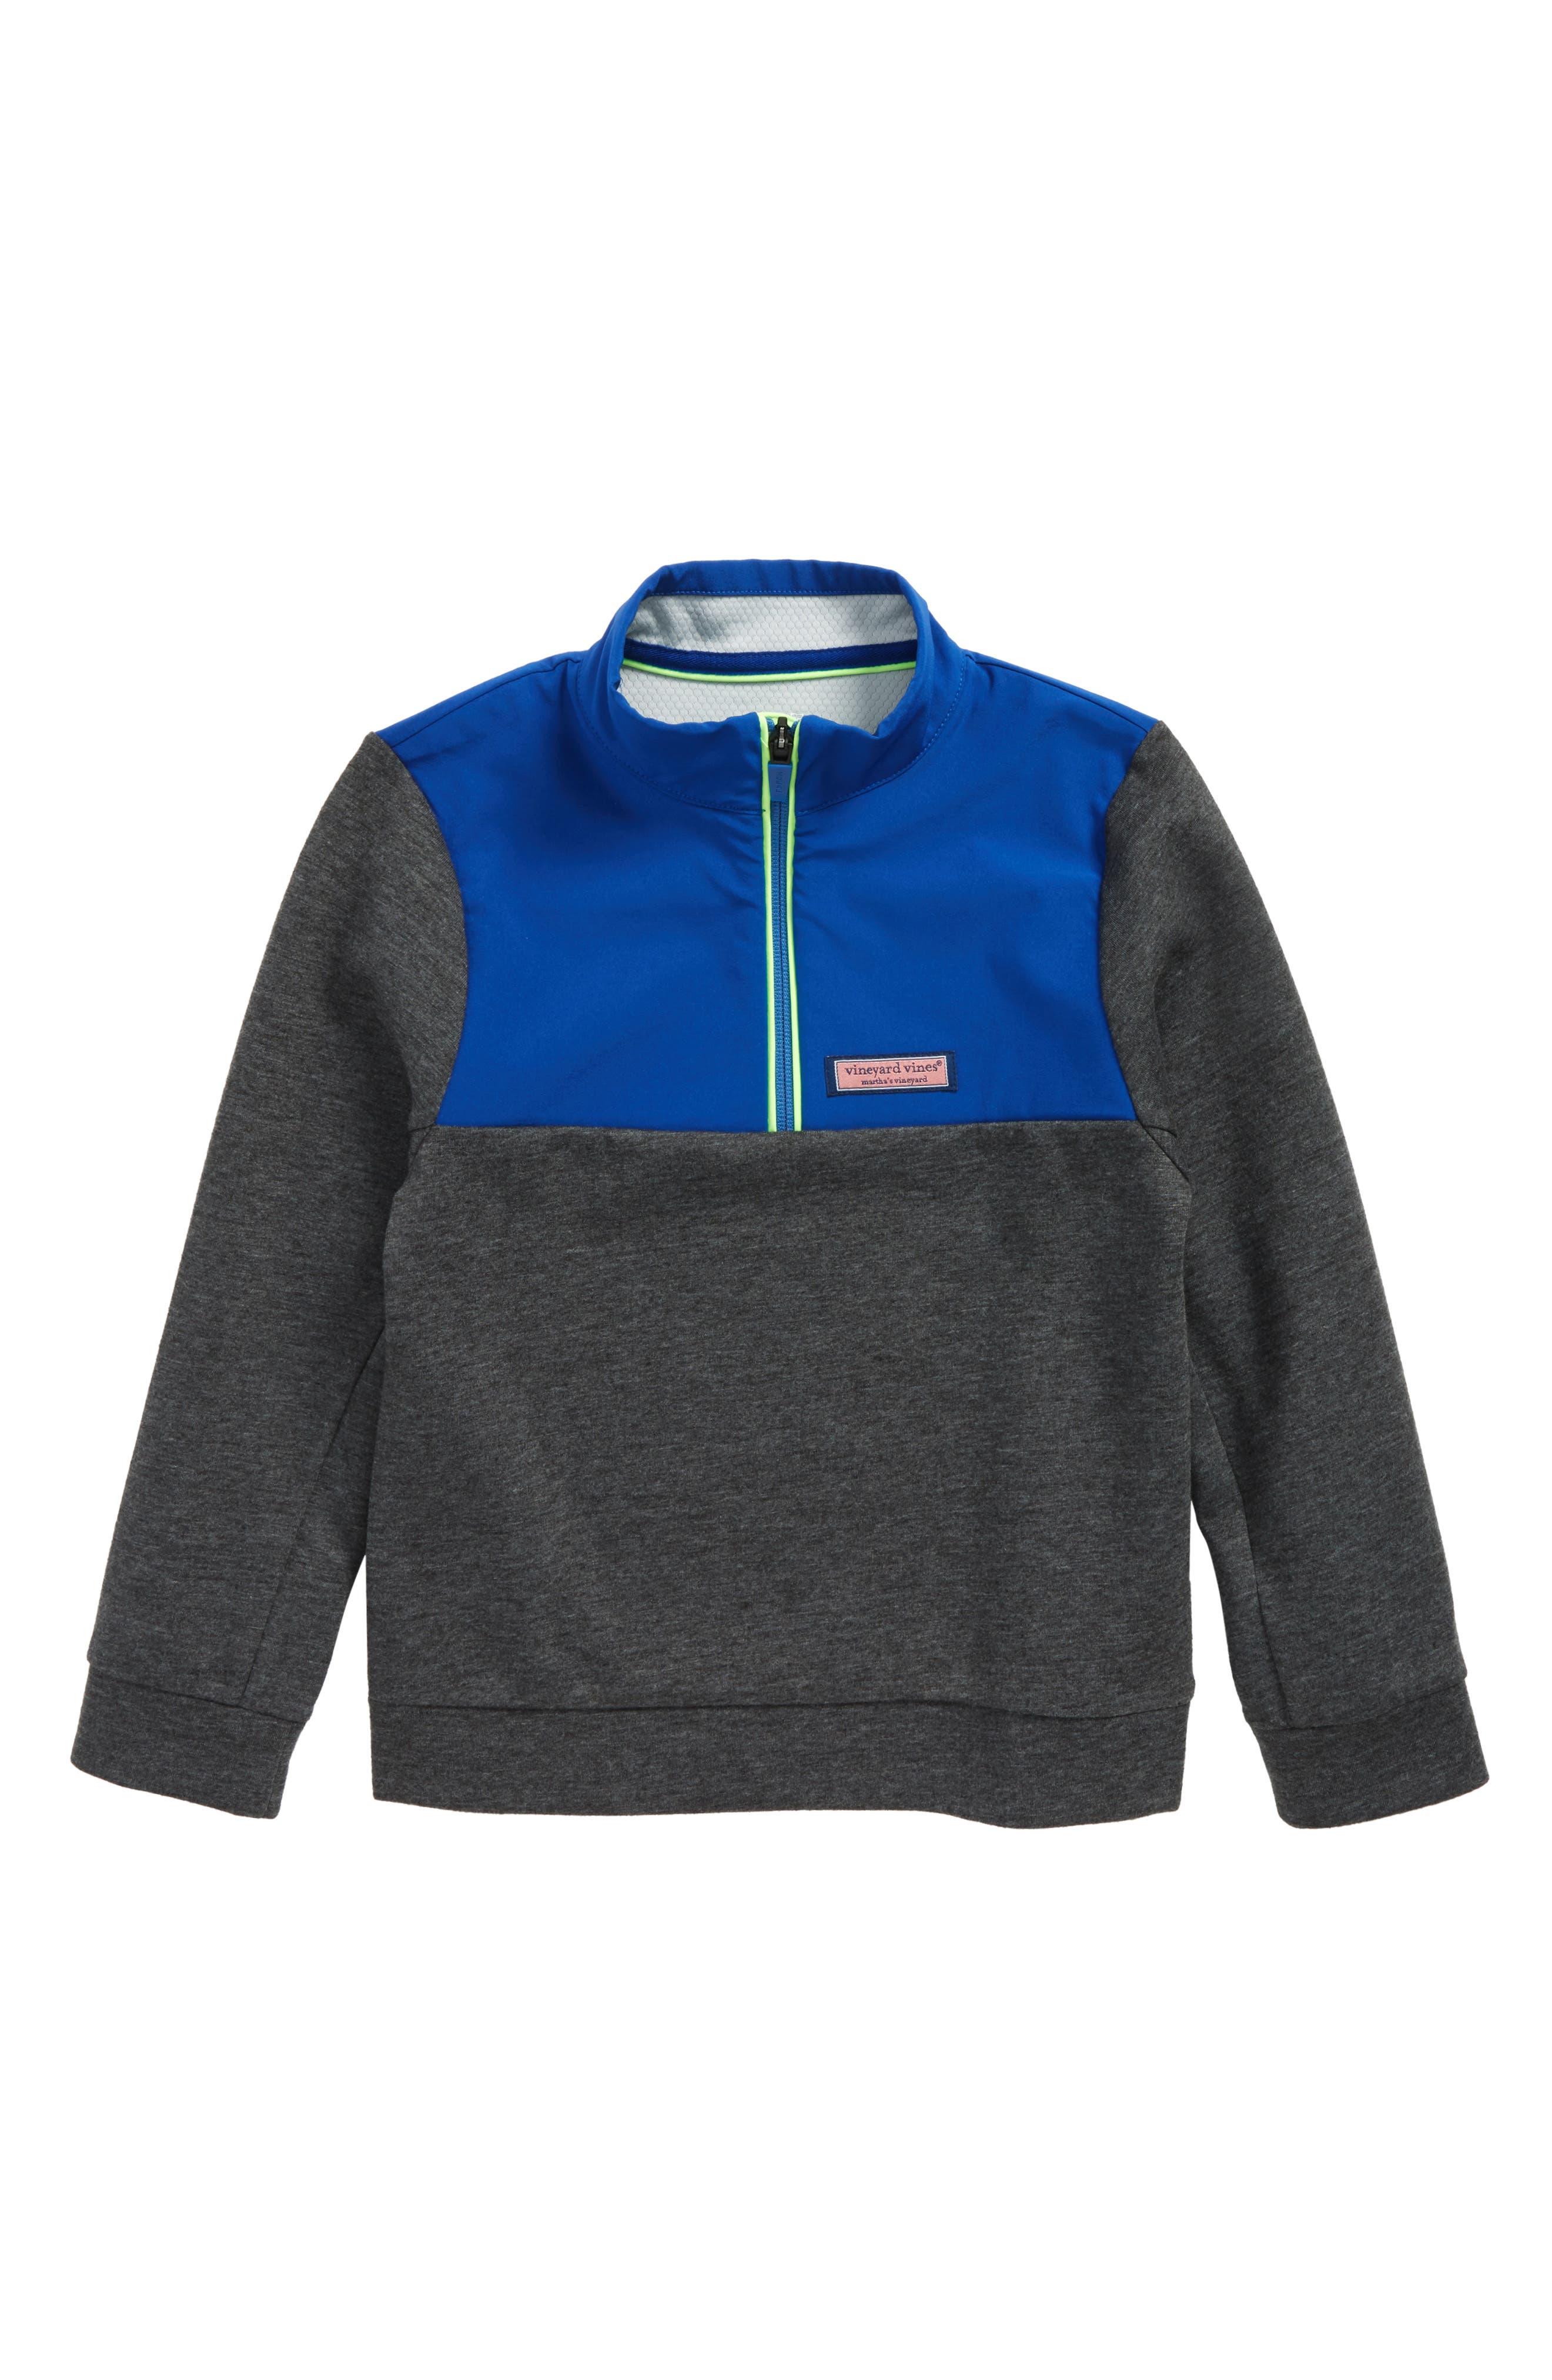 Shep Colorblock Quarter Zip Pullover,                             Main thumbnail 1, color,                             Charcoal